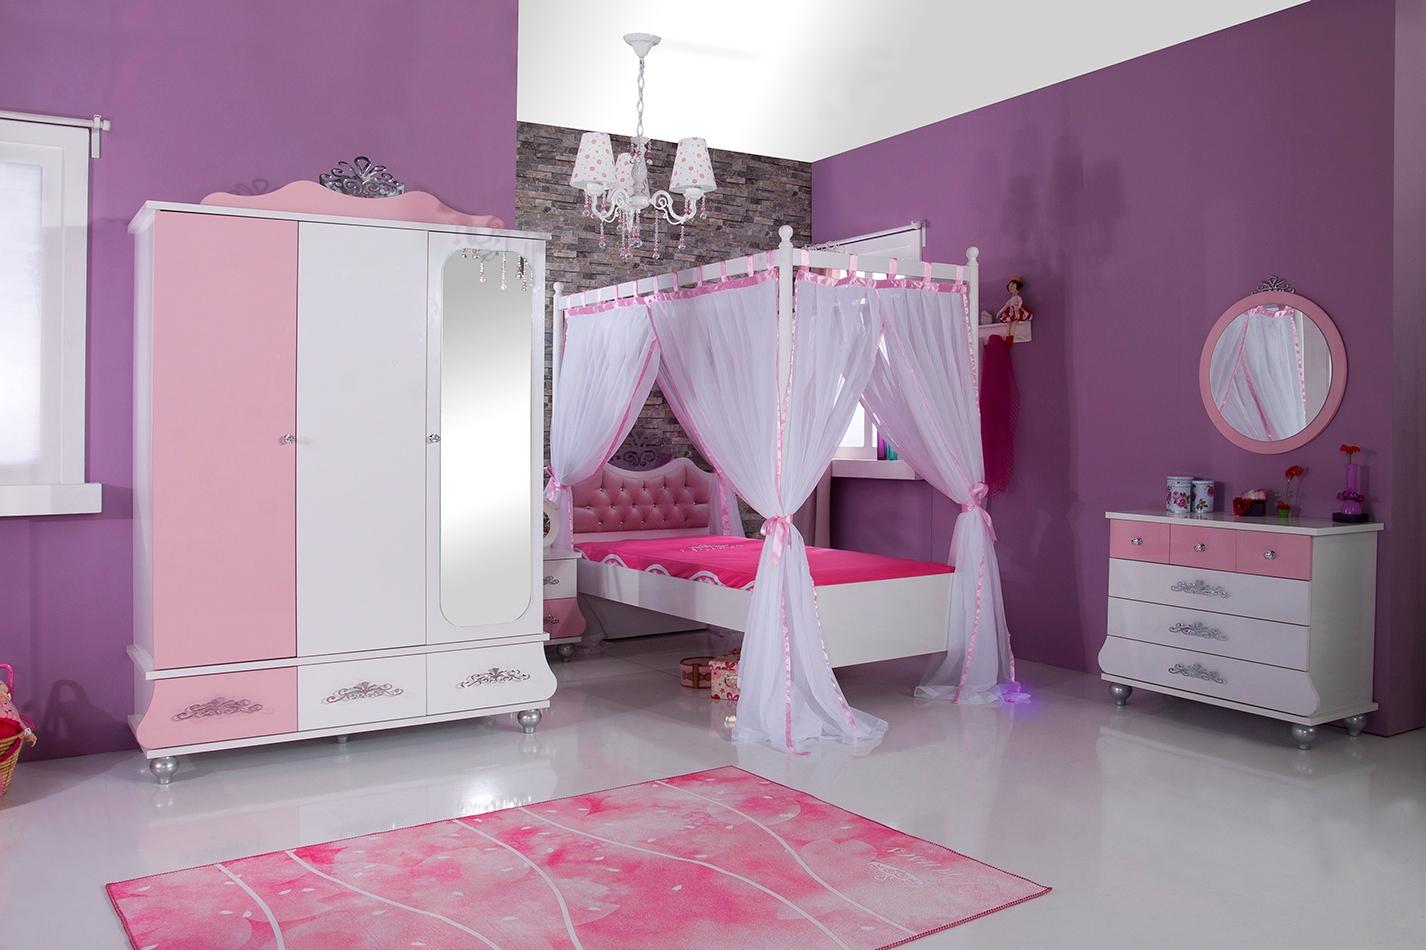 Prinses kinderkamer meisjeskamer roze kinderkamer kinderbed terrashaard en barbecues - Bed voor een klein meisje ...